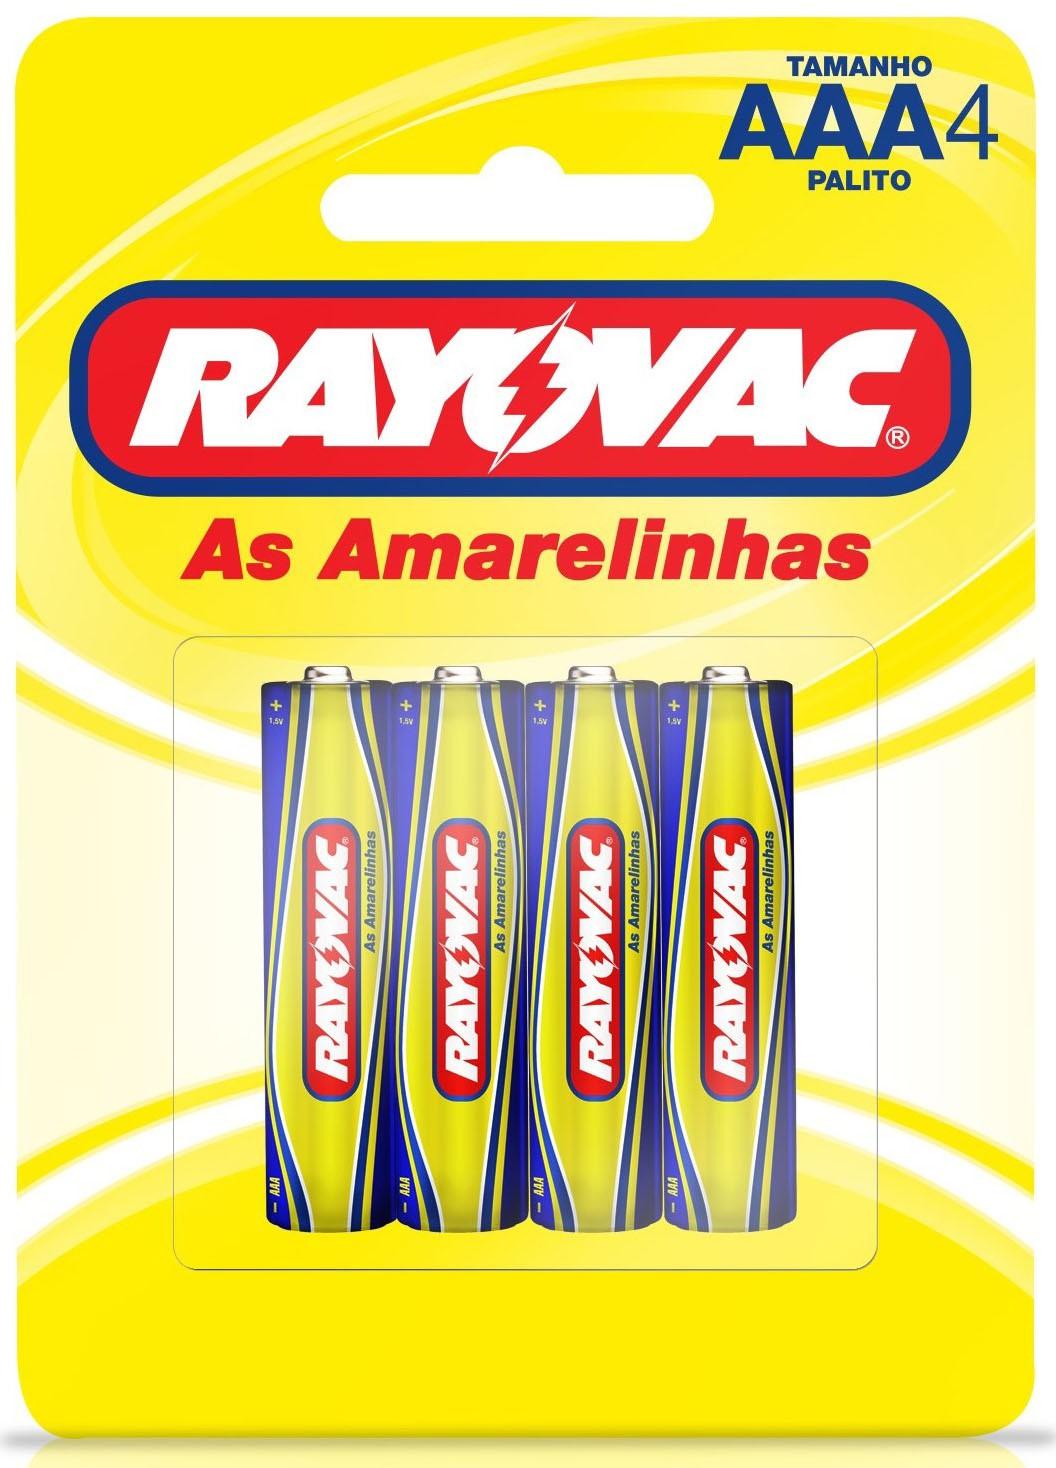 36 Pilhas AAA Zinco Carvão RAYOVAC 9 cartelas